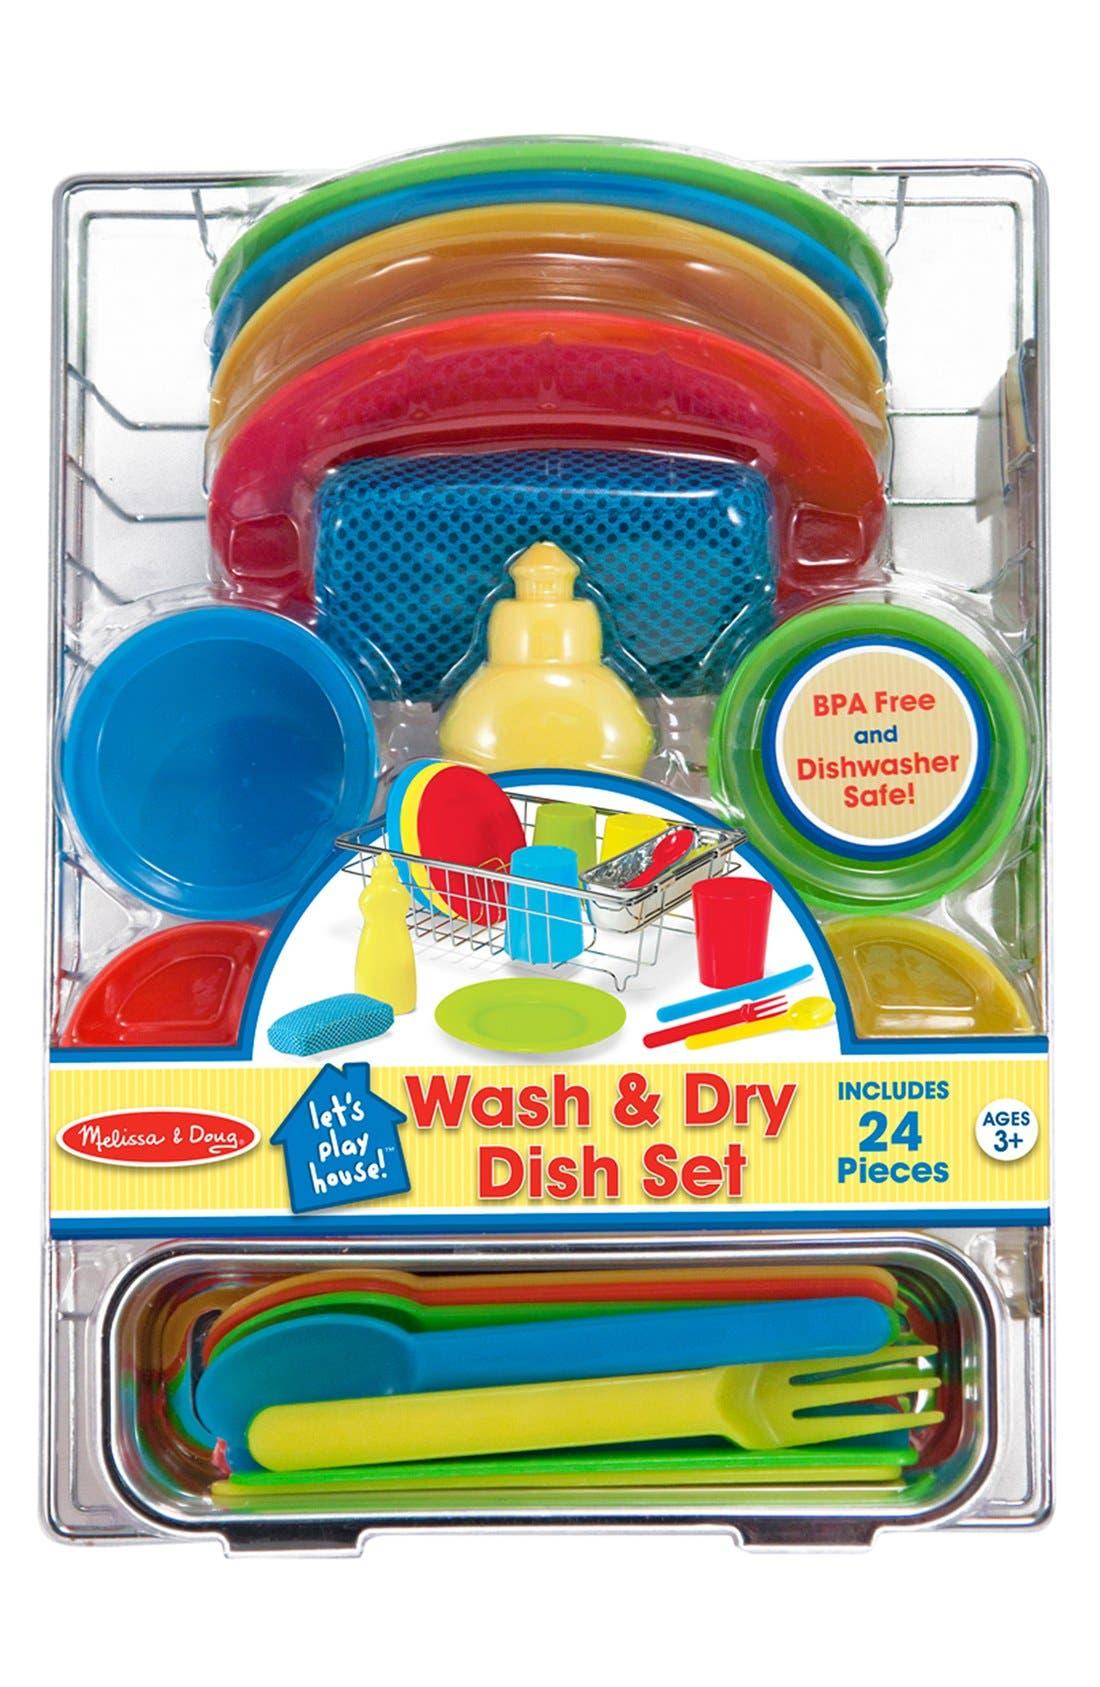 Wash & Dry Dish Set Toy,                         Main,                         color, No Color